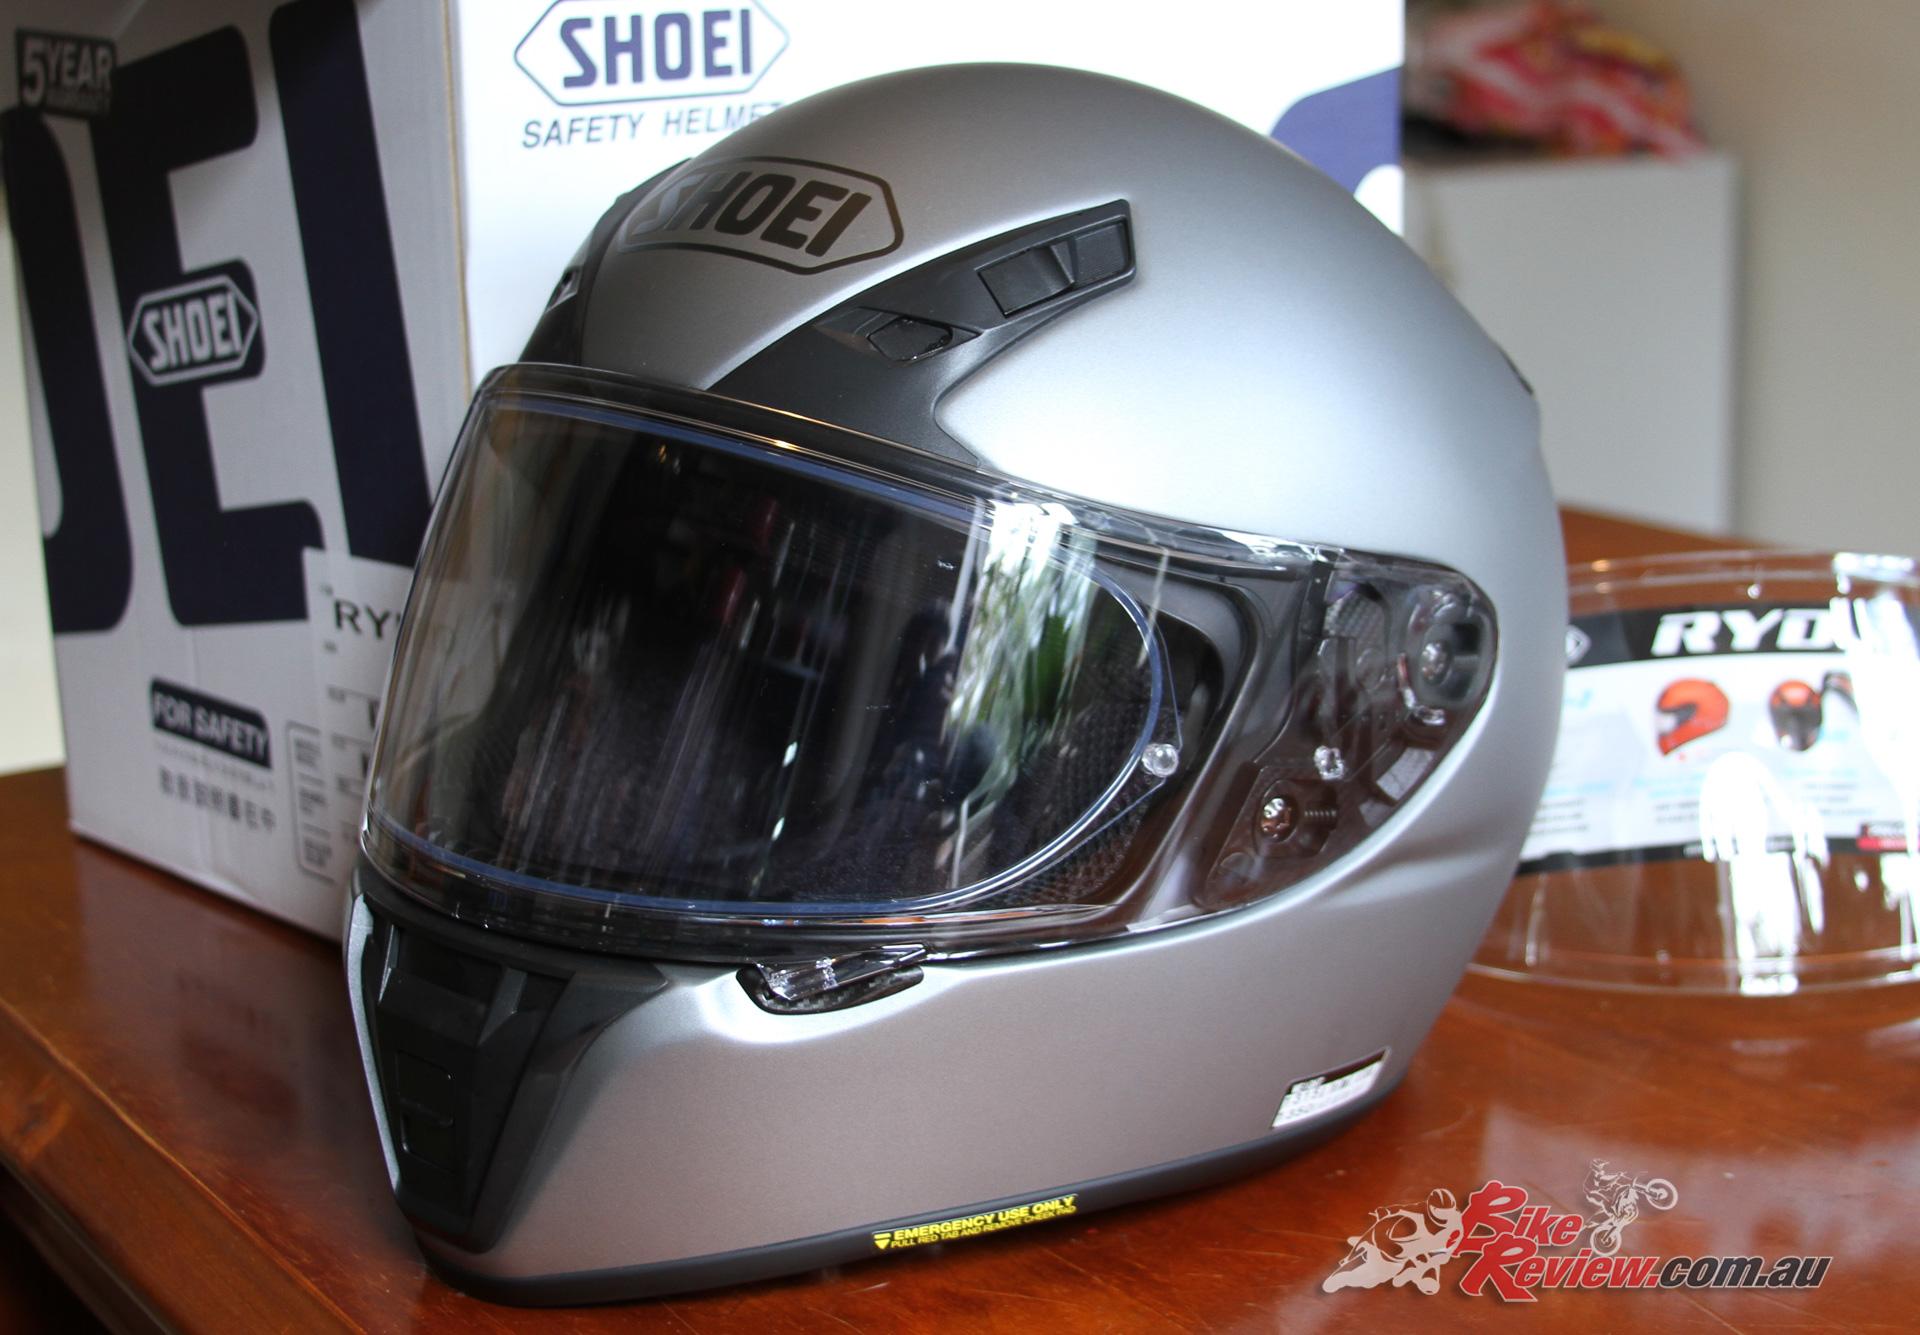 New Product Shoei Transitions Adaptive Shield Bike Review